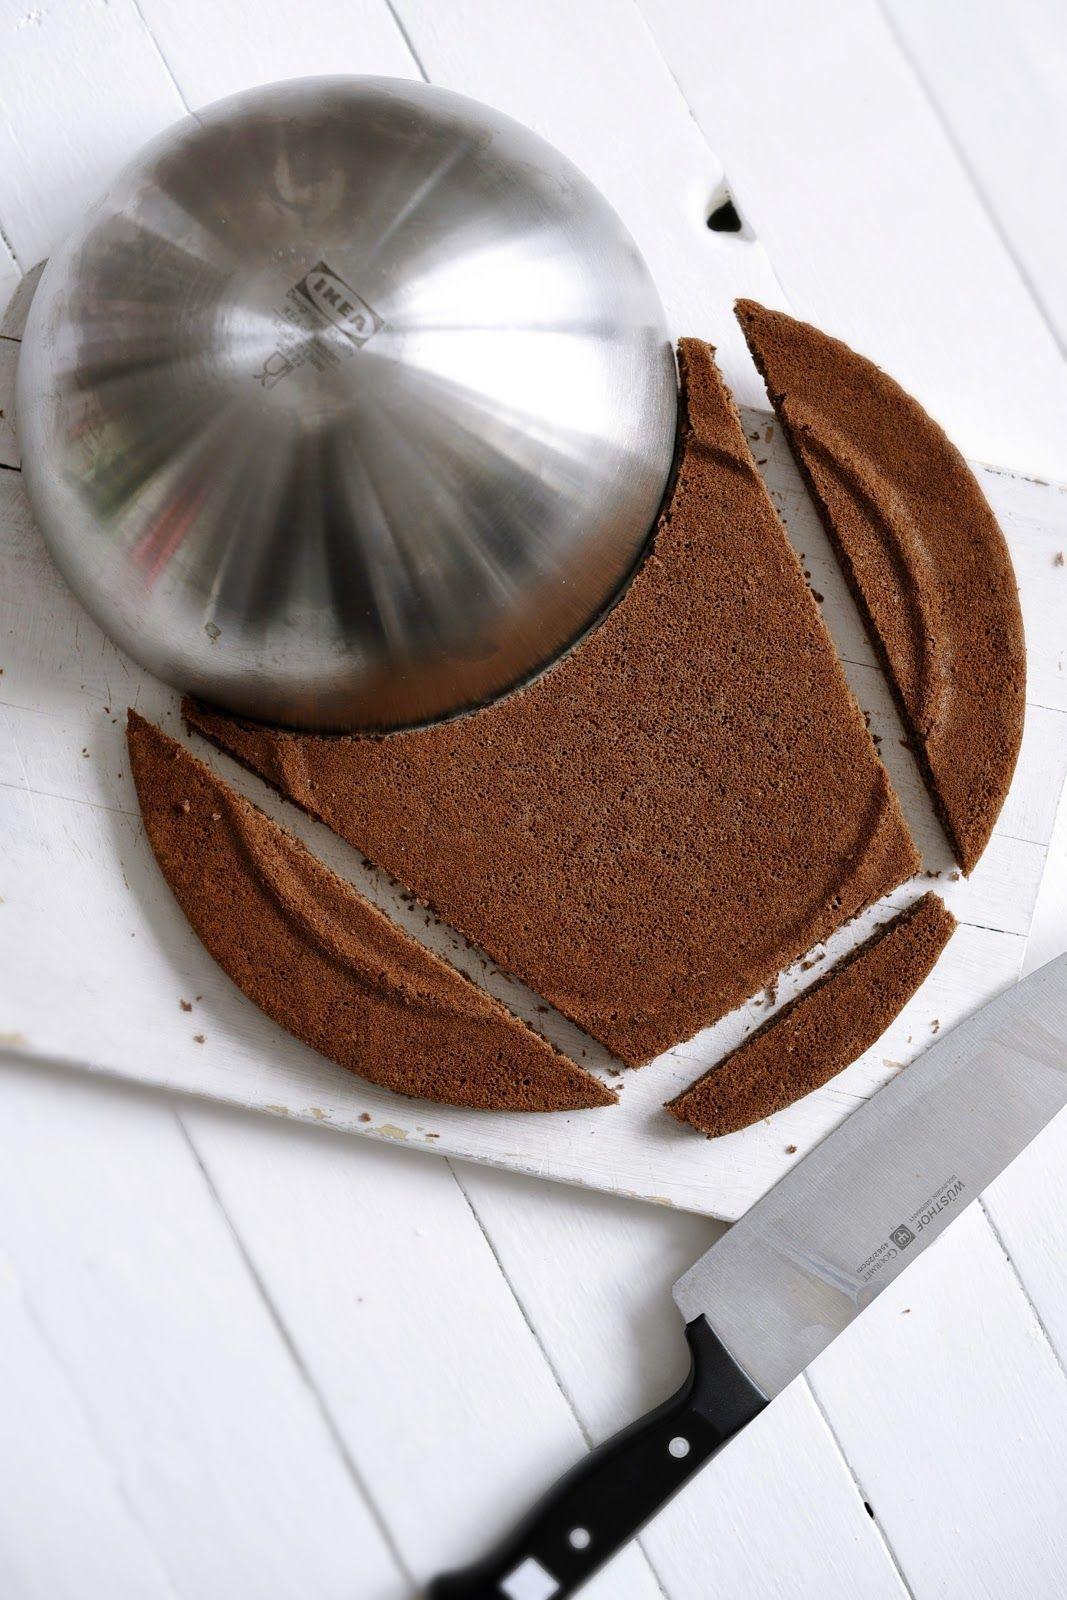 kessy 39 s pink sugar millennium falcon star wars cake 3 d torte cakes pinterest. Black Bedroom Furniture Sets. Home Design Ideas